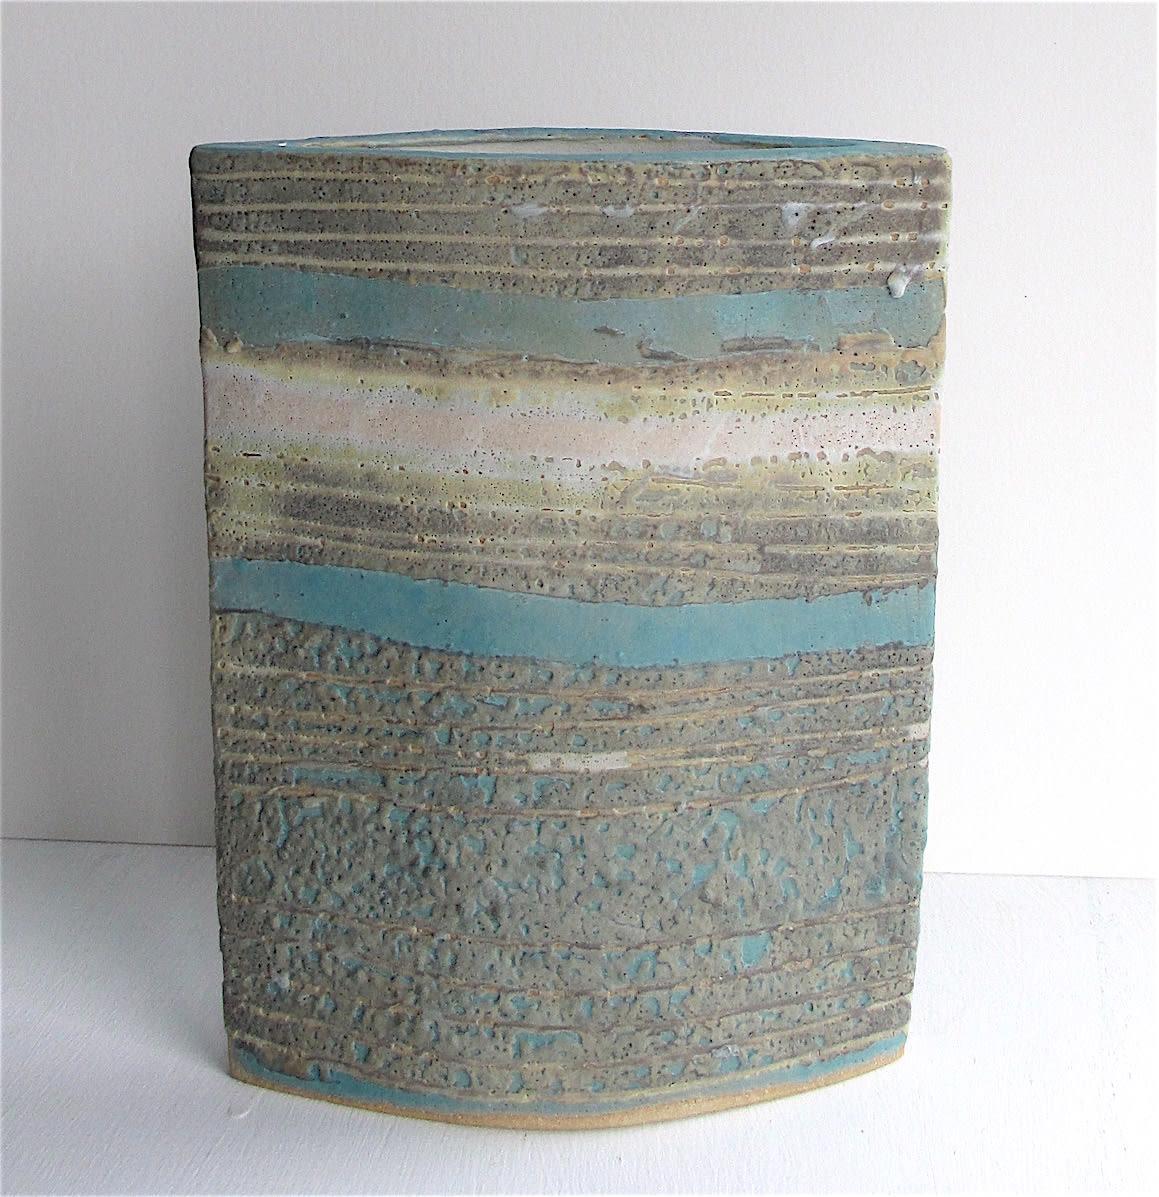 "<span class=""link fancybox-details-link""><a href=""/artists/44-sarah-perry/works/7447-sarah-perry-pale-water-ellipse-2020/"">View Detail Page</a></span><div class=""artist""><strong>Sarah Perry</strong></div> b. 1945 <div class=""title""><em>Pale Water Ellipse</em>, 2020</div> <div class=""medium"">Stoneware<br /> Impressed with the artist's seal 'SP'</div> <div class=""dimensions"">h. 22 cm x w. 17 cm x d. 4.5 cm </div><div class=""price"">£210.00</div><div class=""copyright_line"">Own Art: £21 x 10 months, 0% APR</div>"